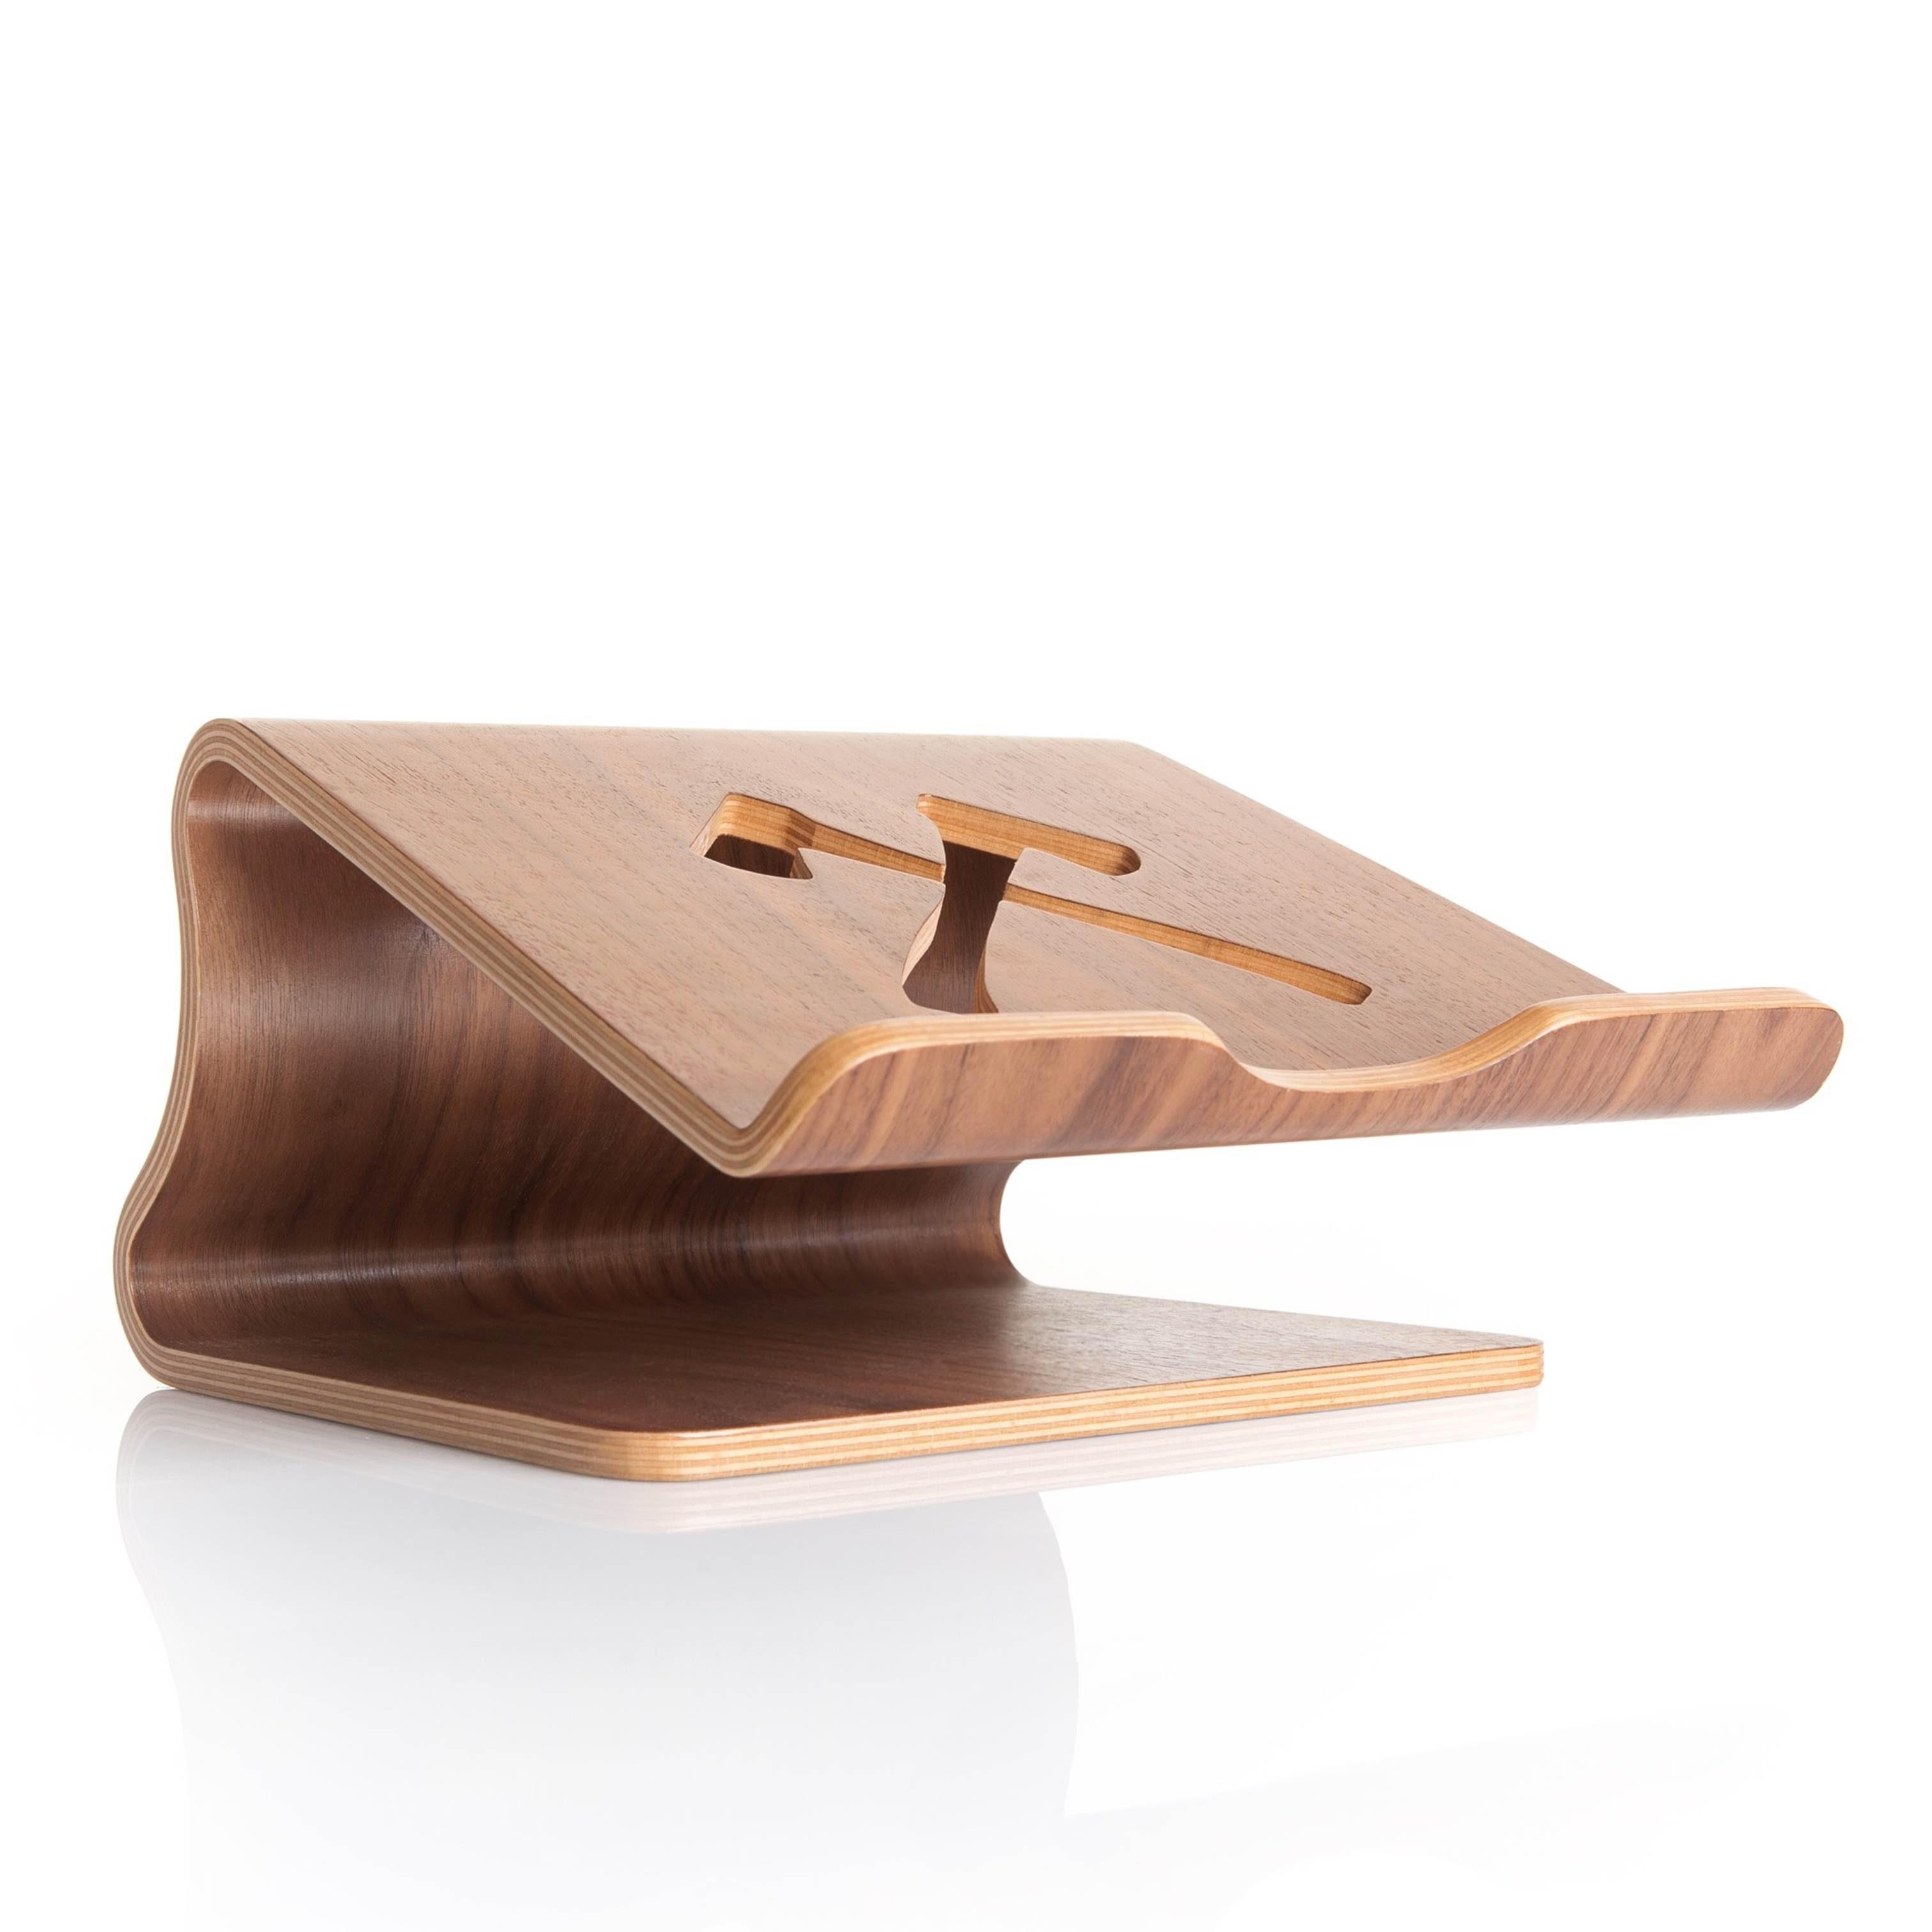 Woodcessories EcoLift - Ergonomischer Laptopständer (11-19 Zoll) aus Echtholz